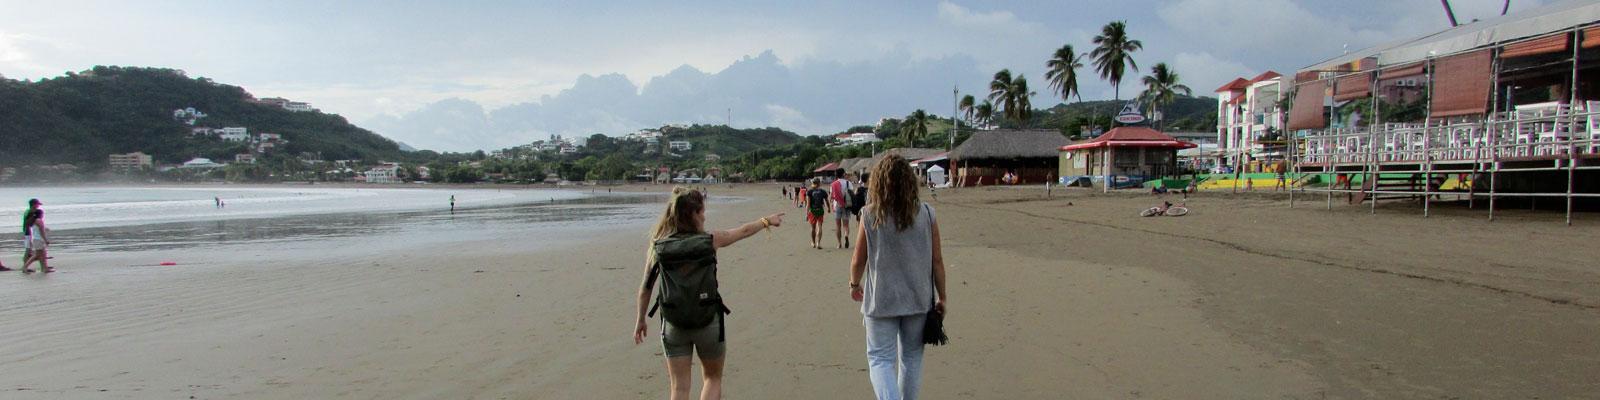 Emilie Benoit Vegan Travel Blogs